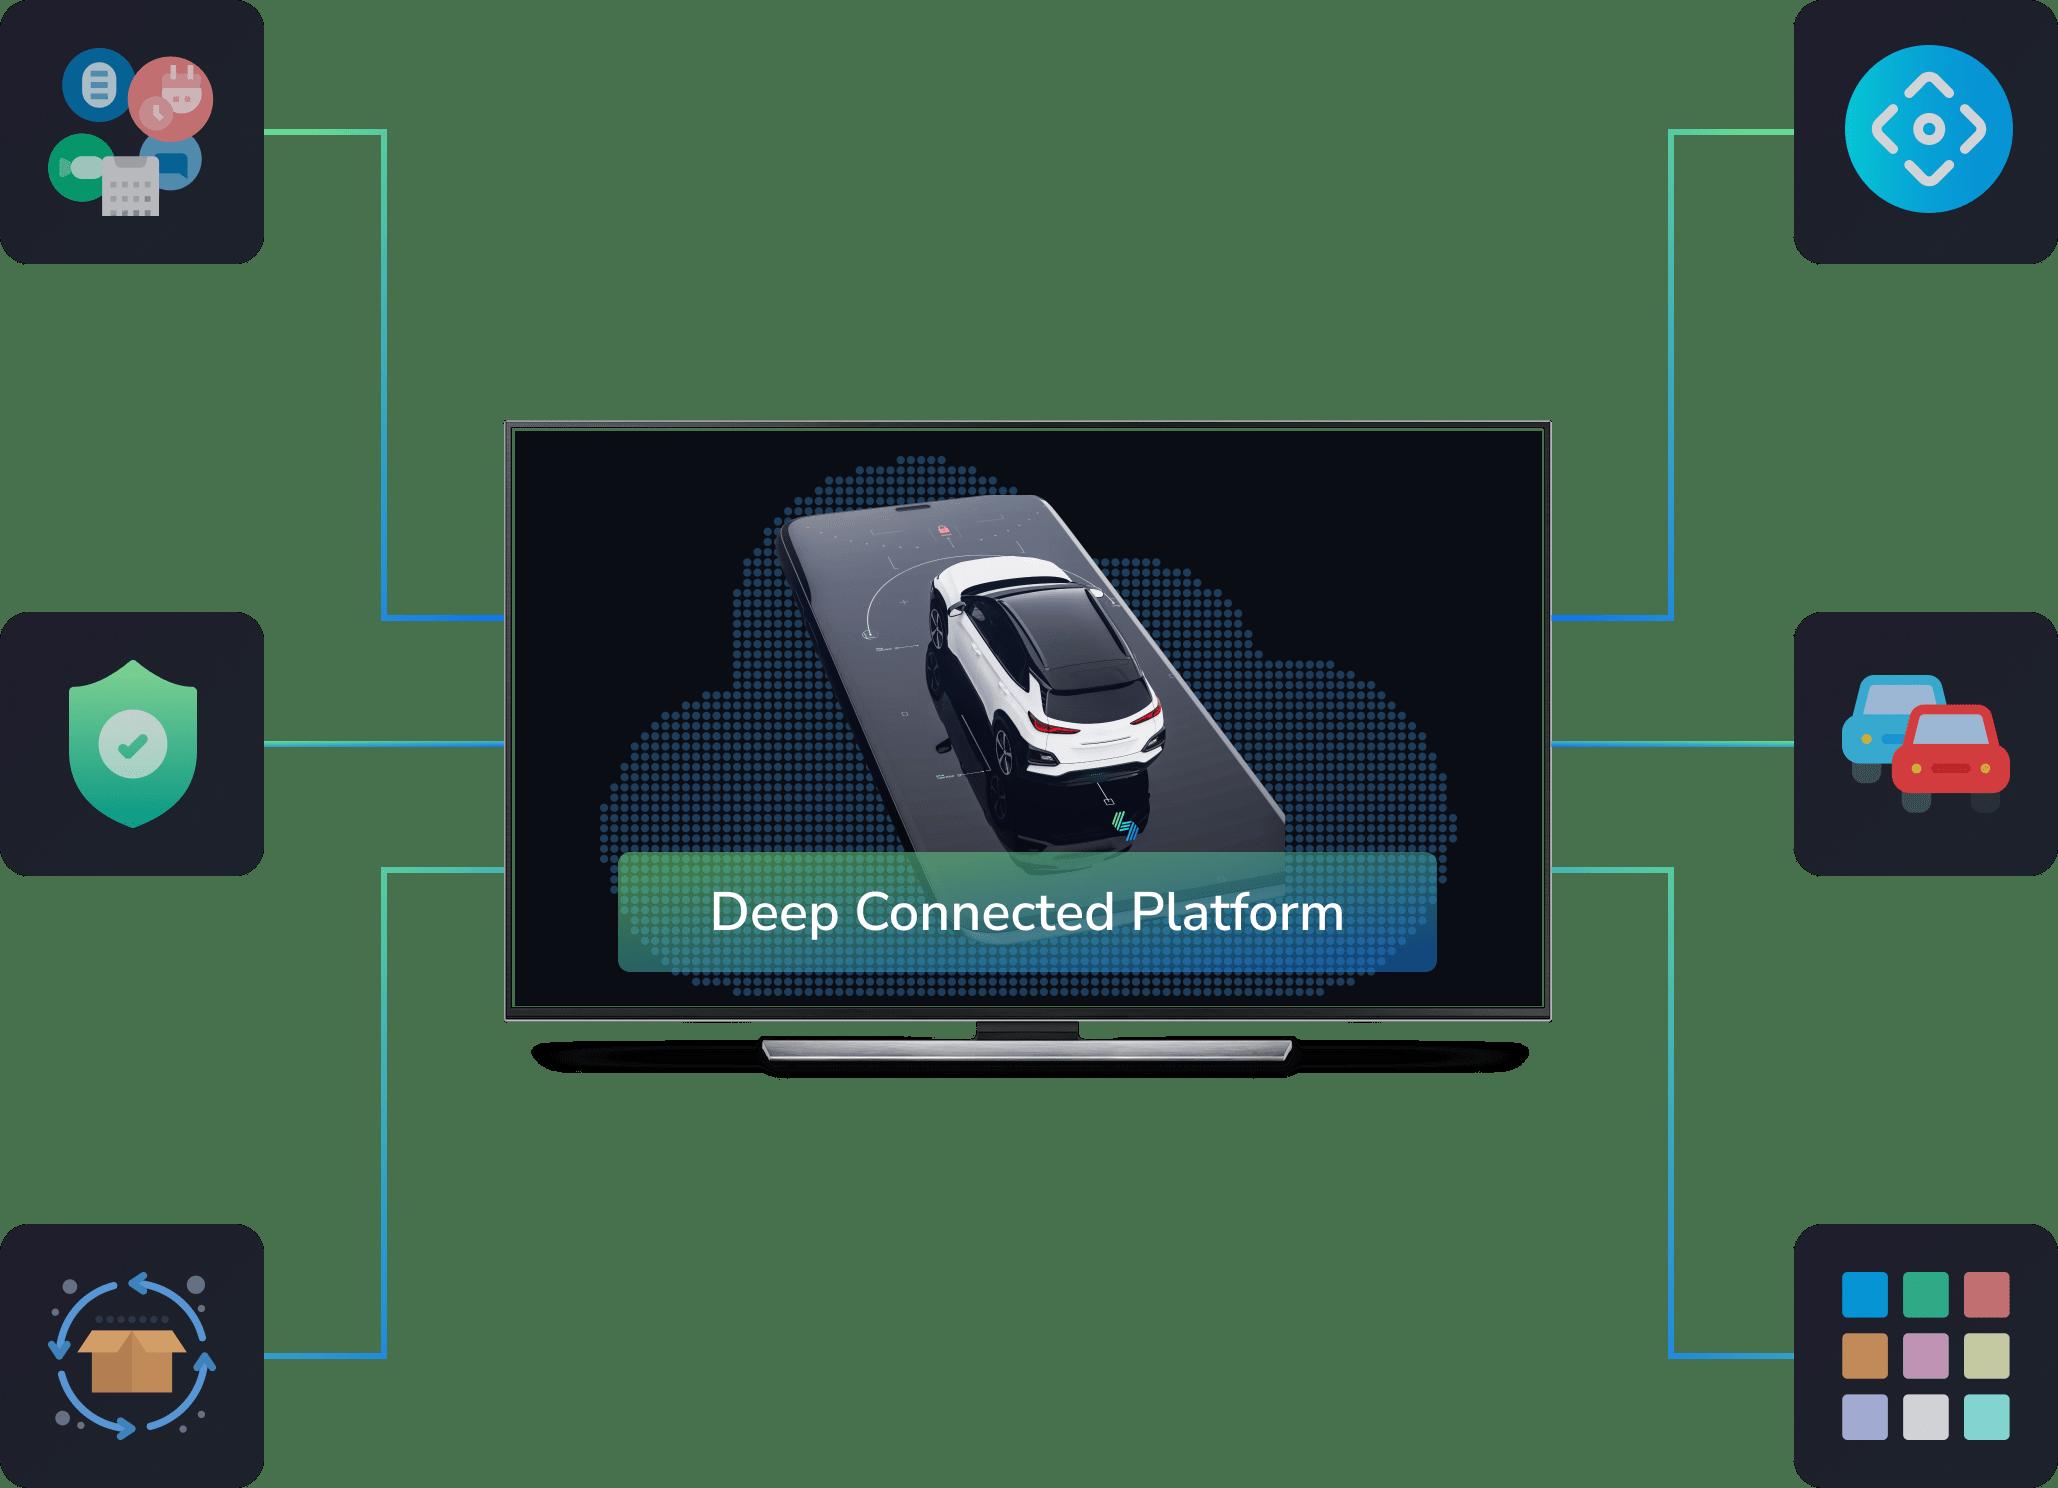 Deep Connected Platform